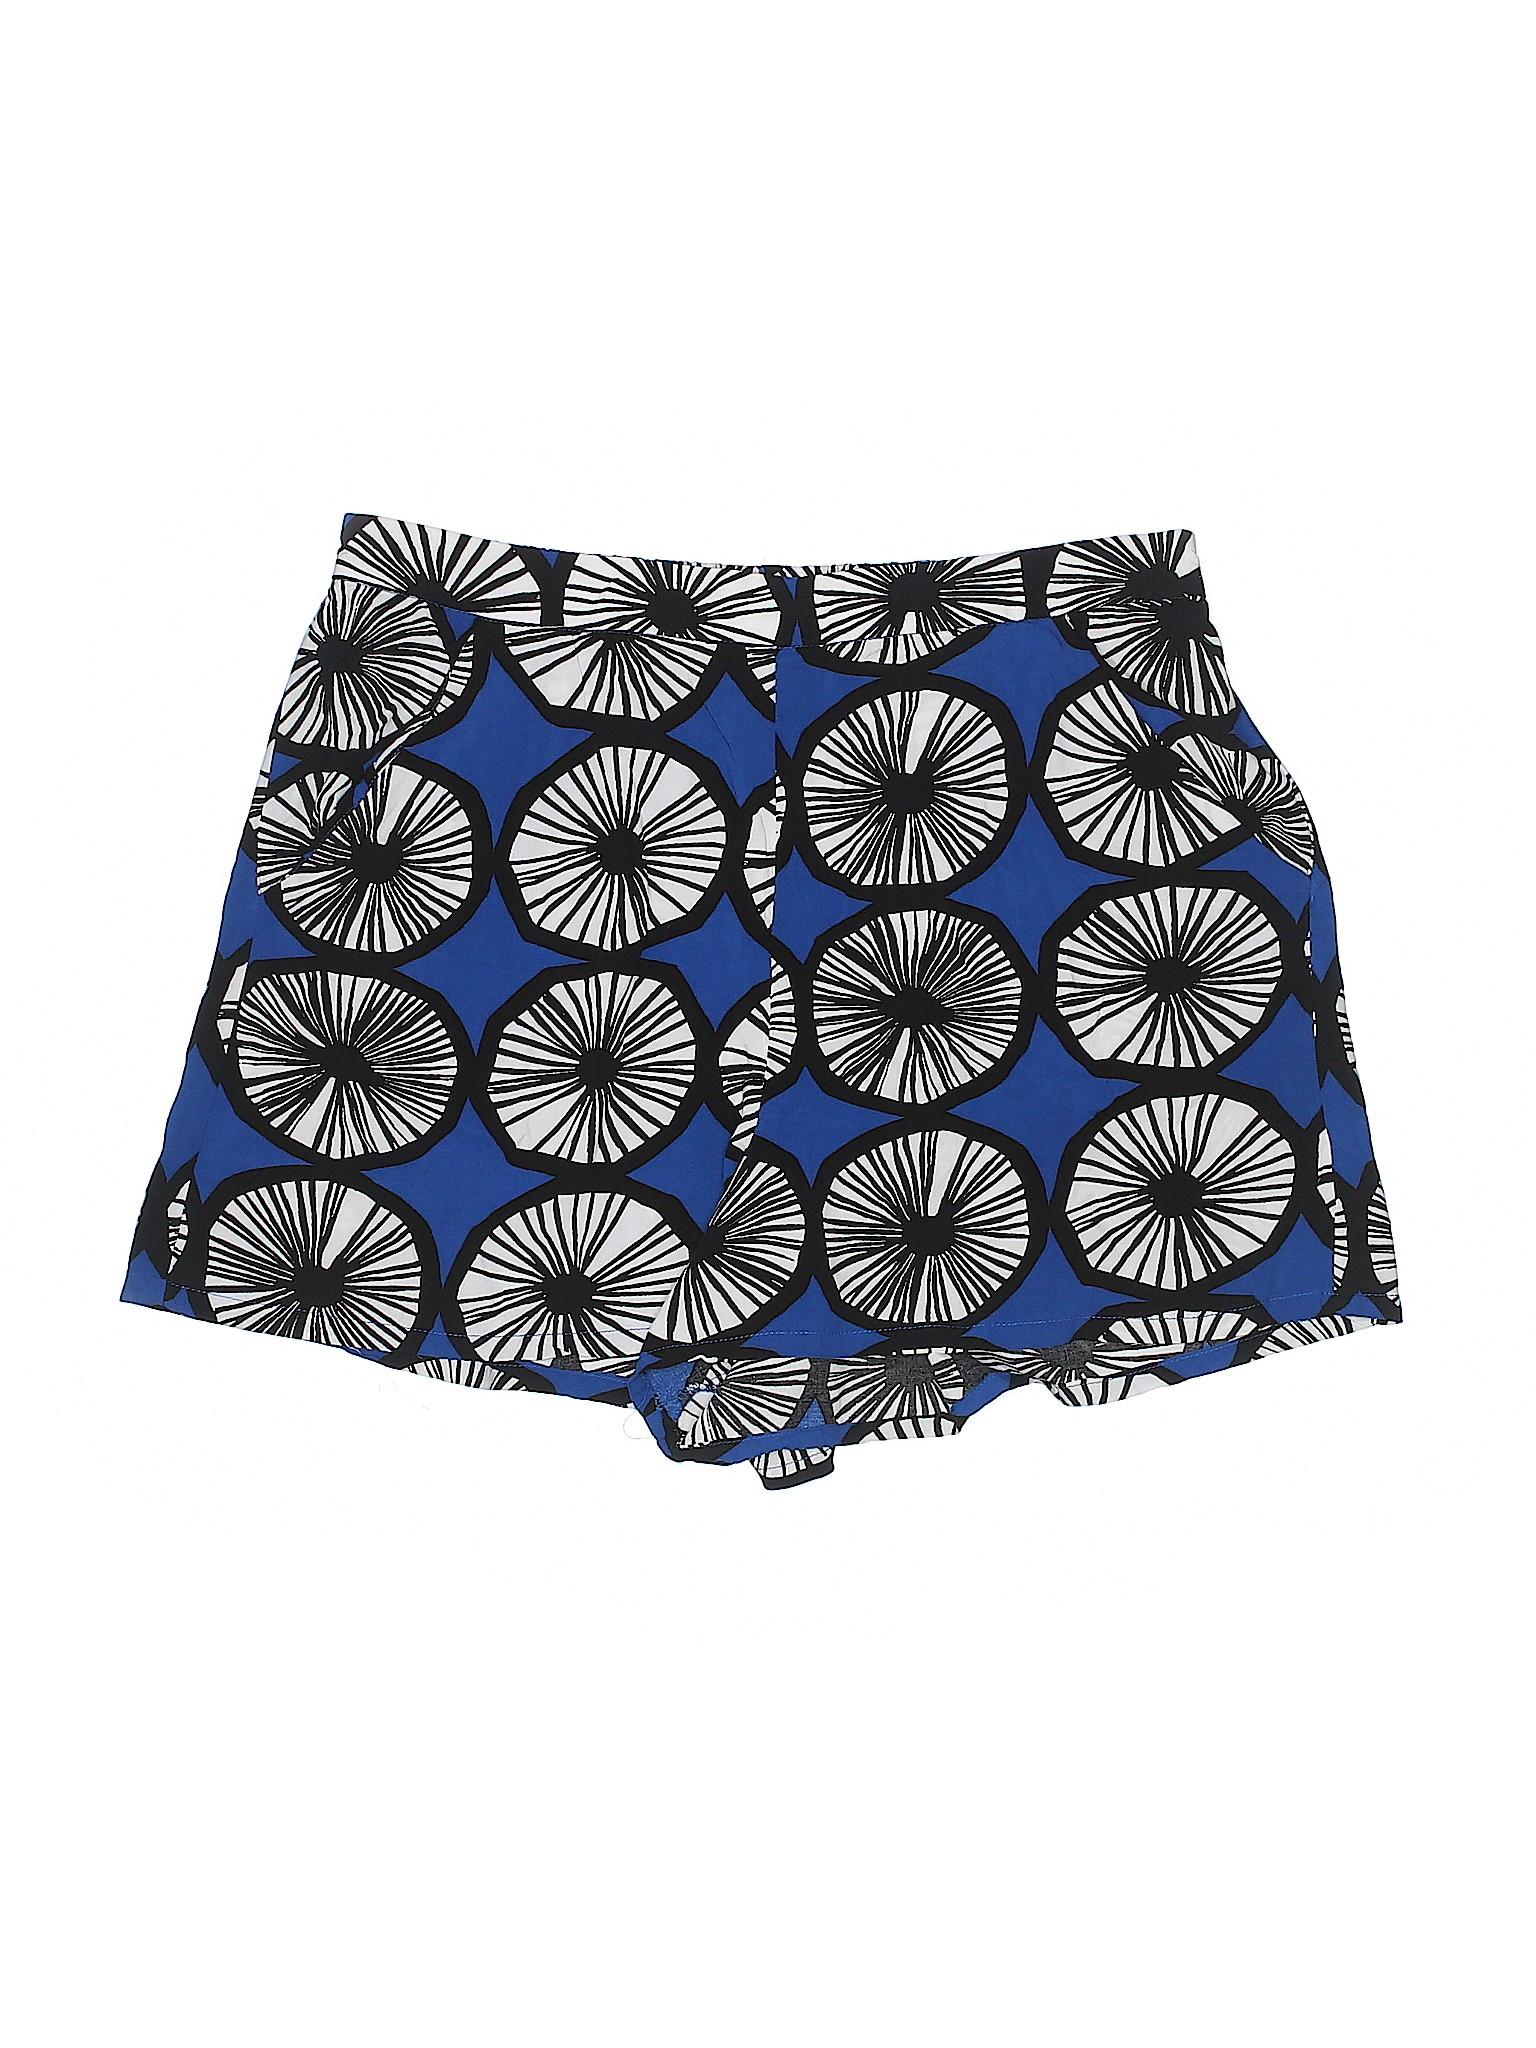 Target Boutique Marimekko leisure Shorts for qUawBtU